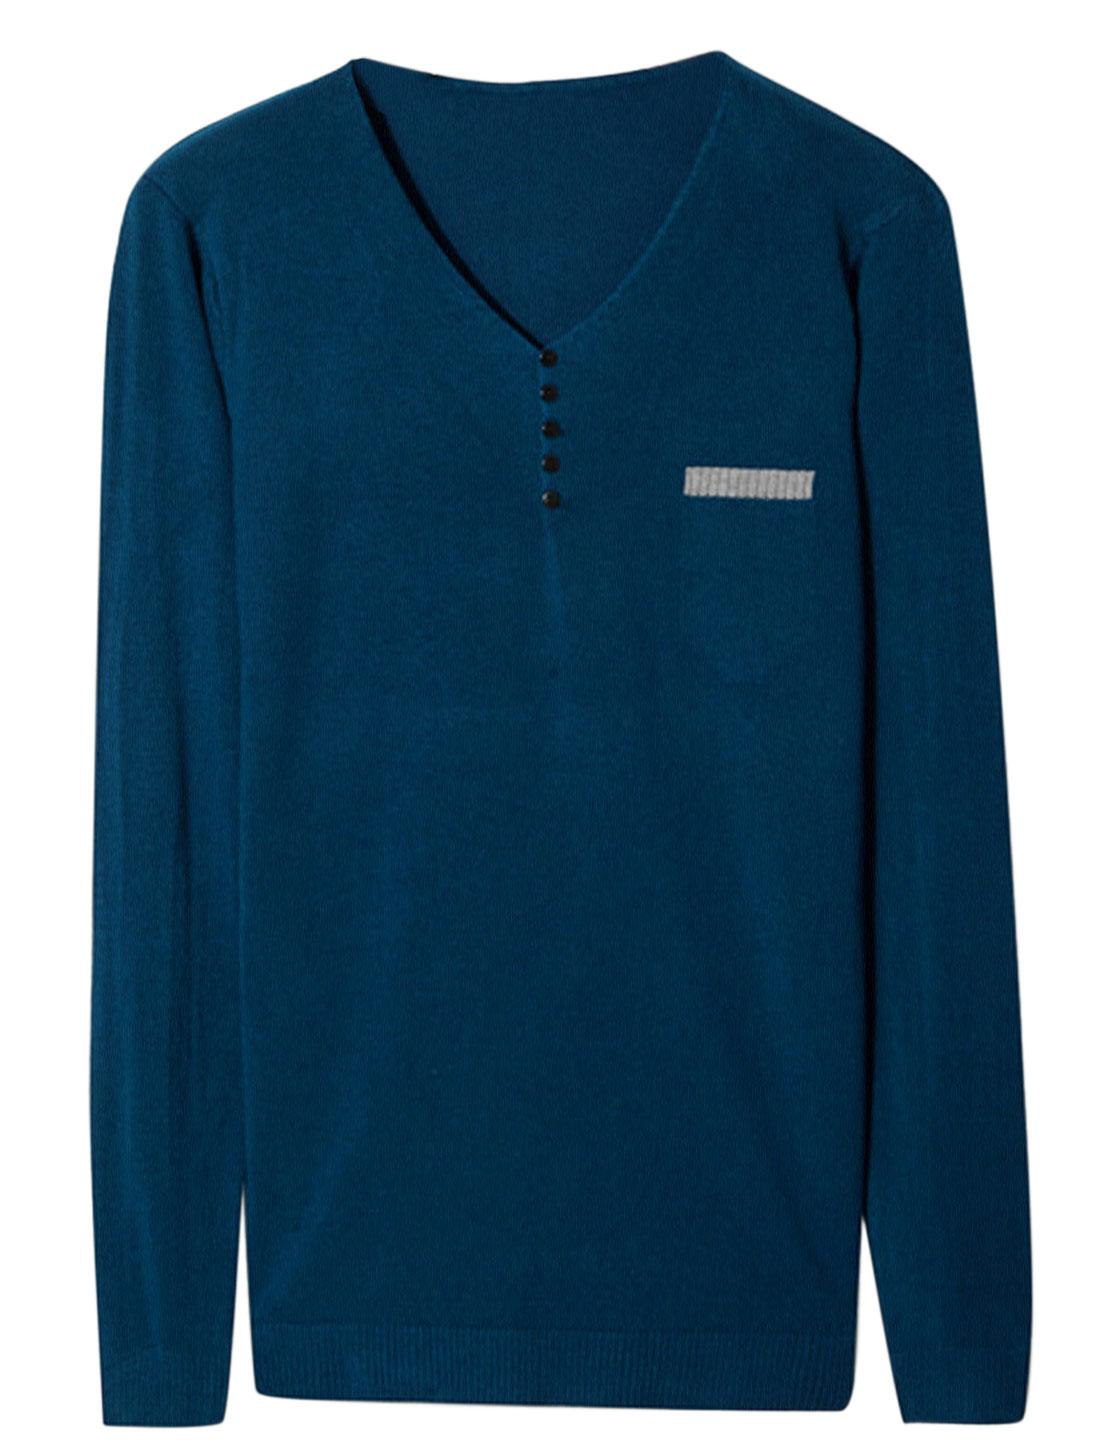 Men V Neck Long Sleeve Buttons Decor Casual Knit Shirt Navy Blue M